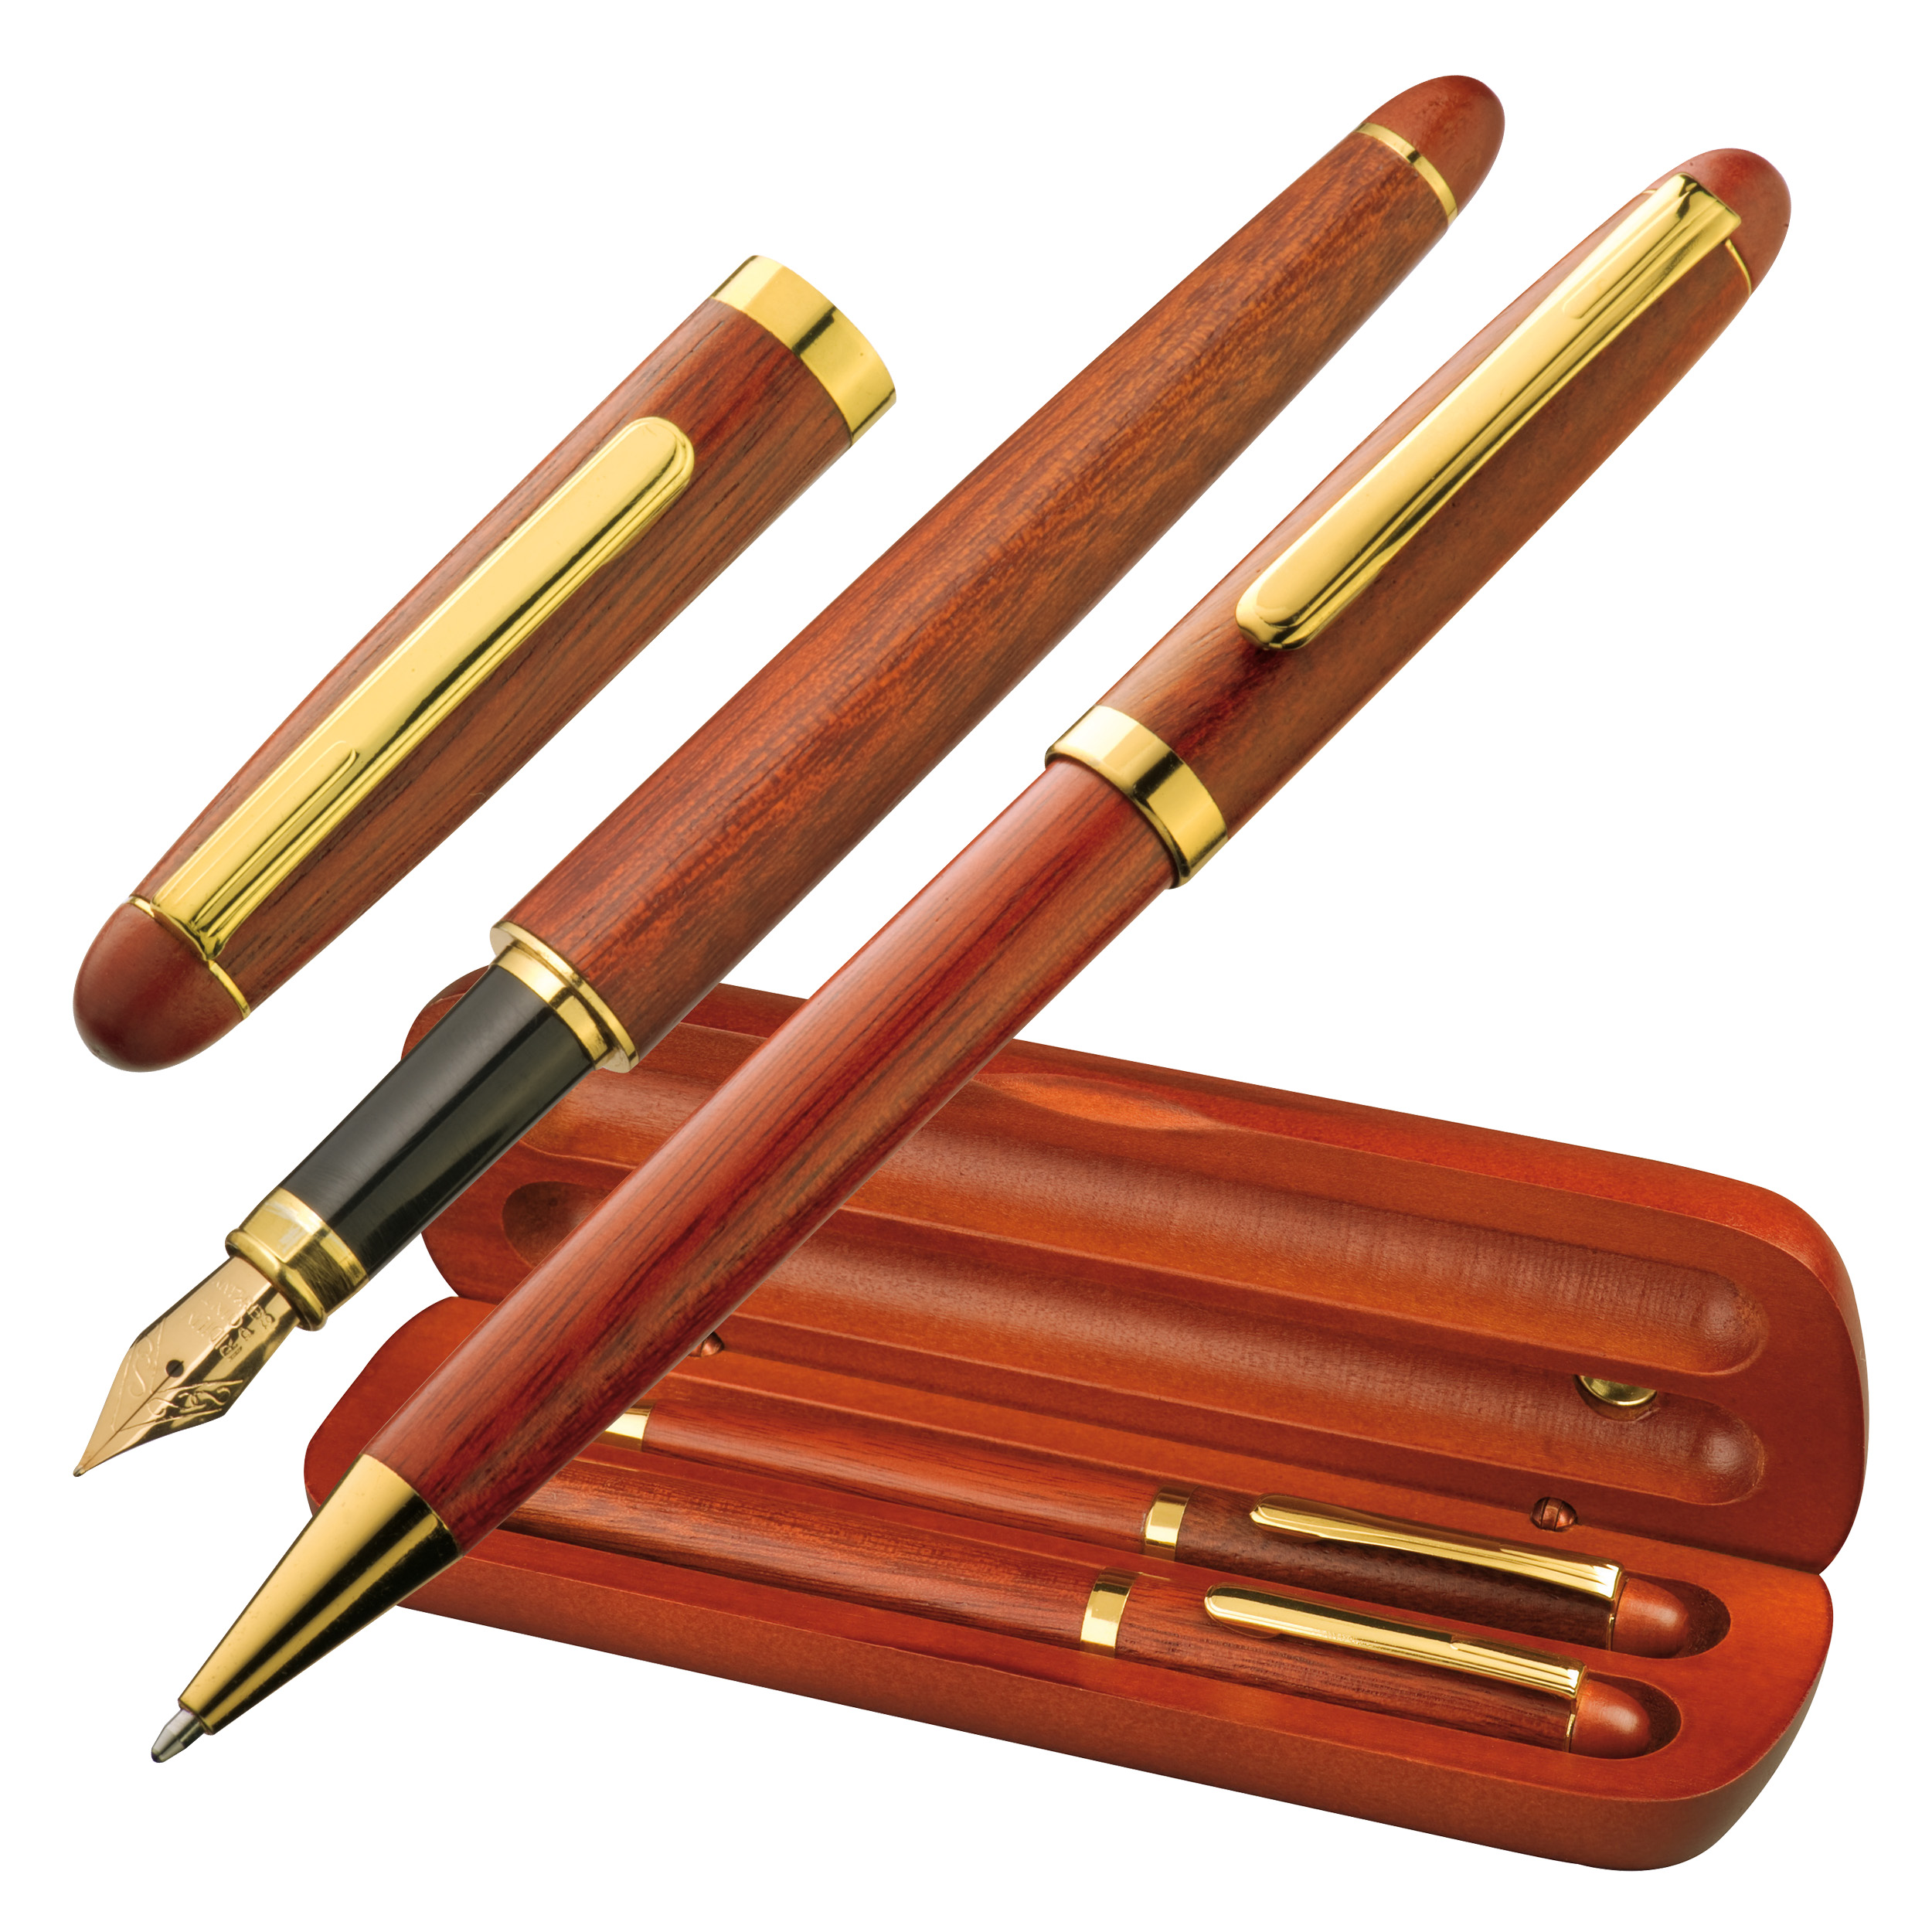 Rosewood pen set in case